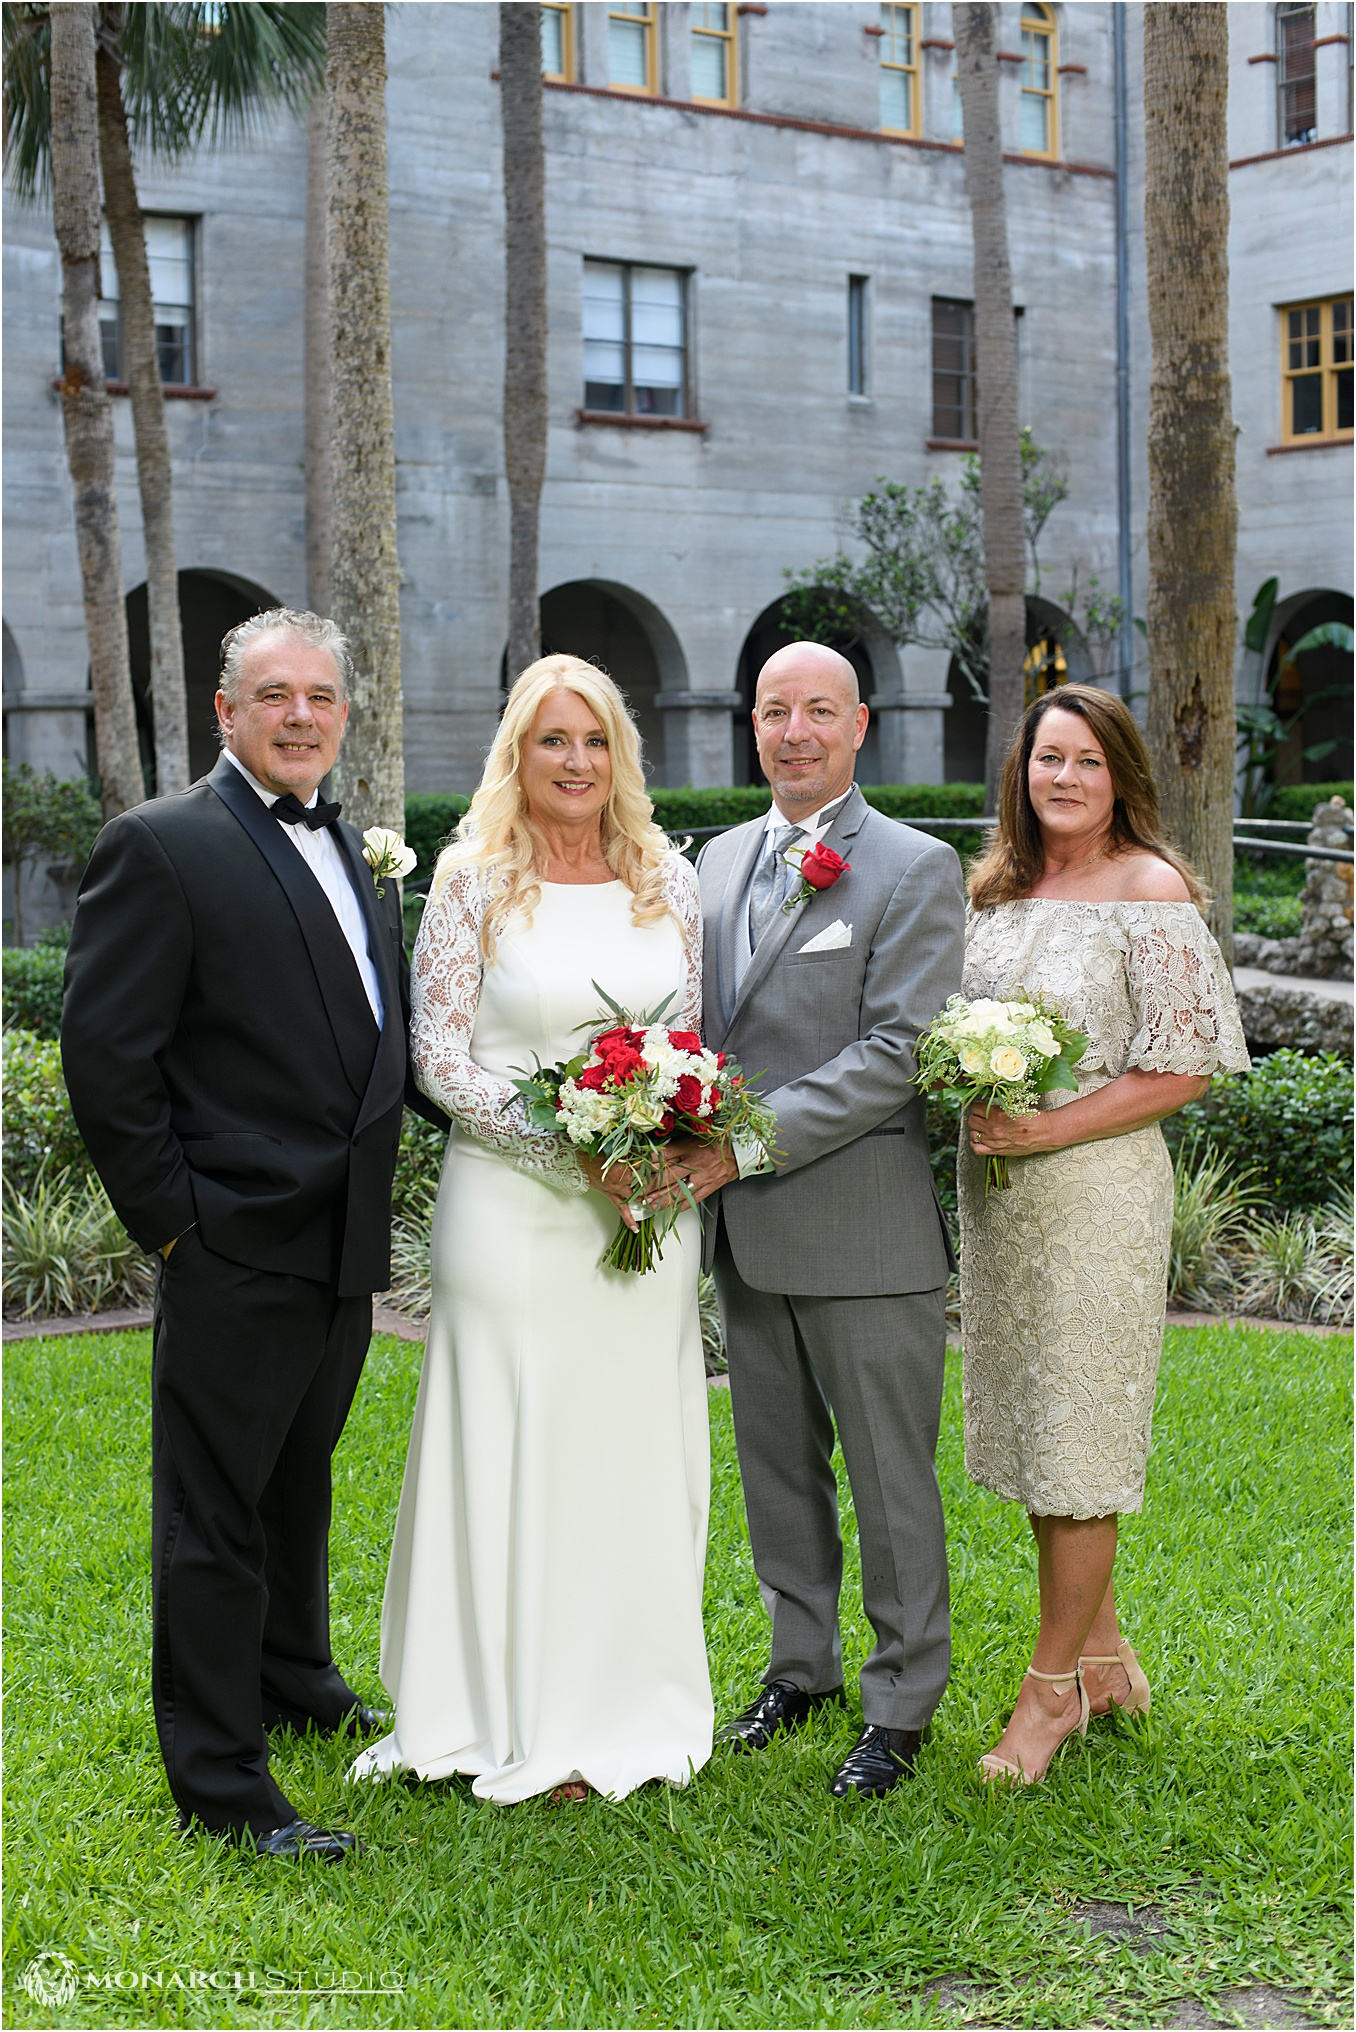 june-2019-saint-augustine-wedding-025.jpg